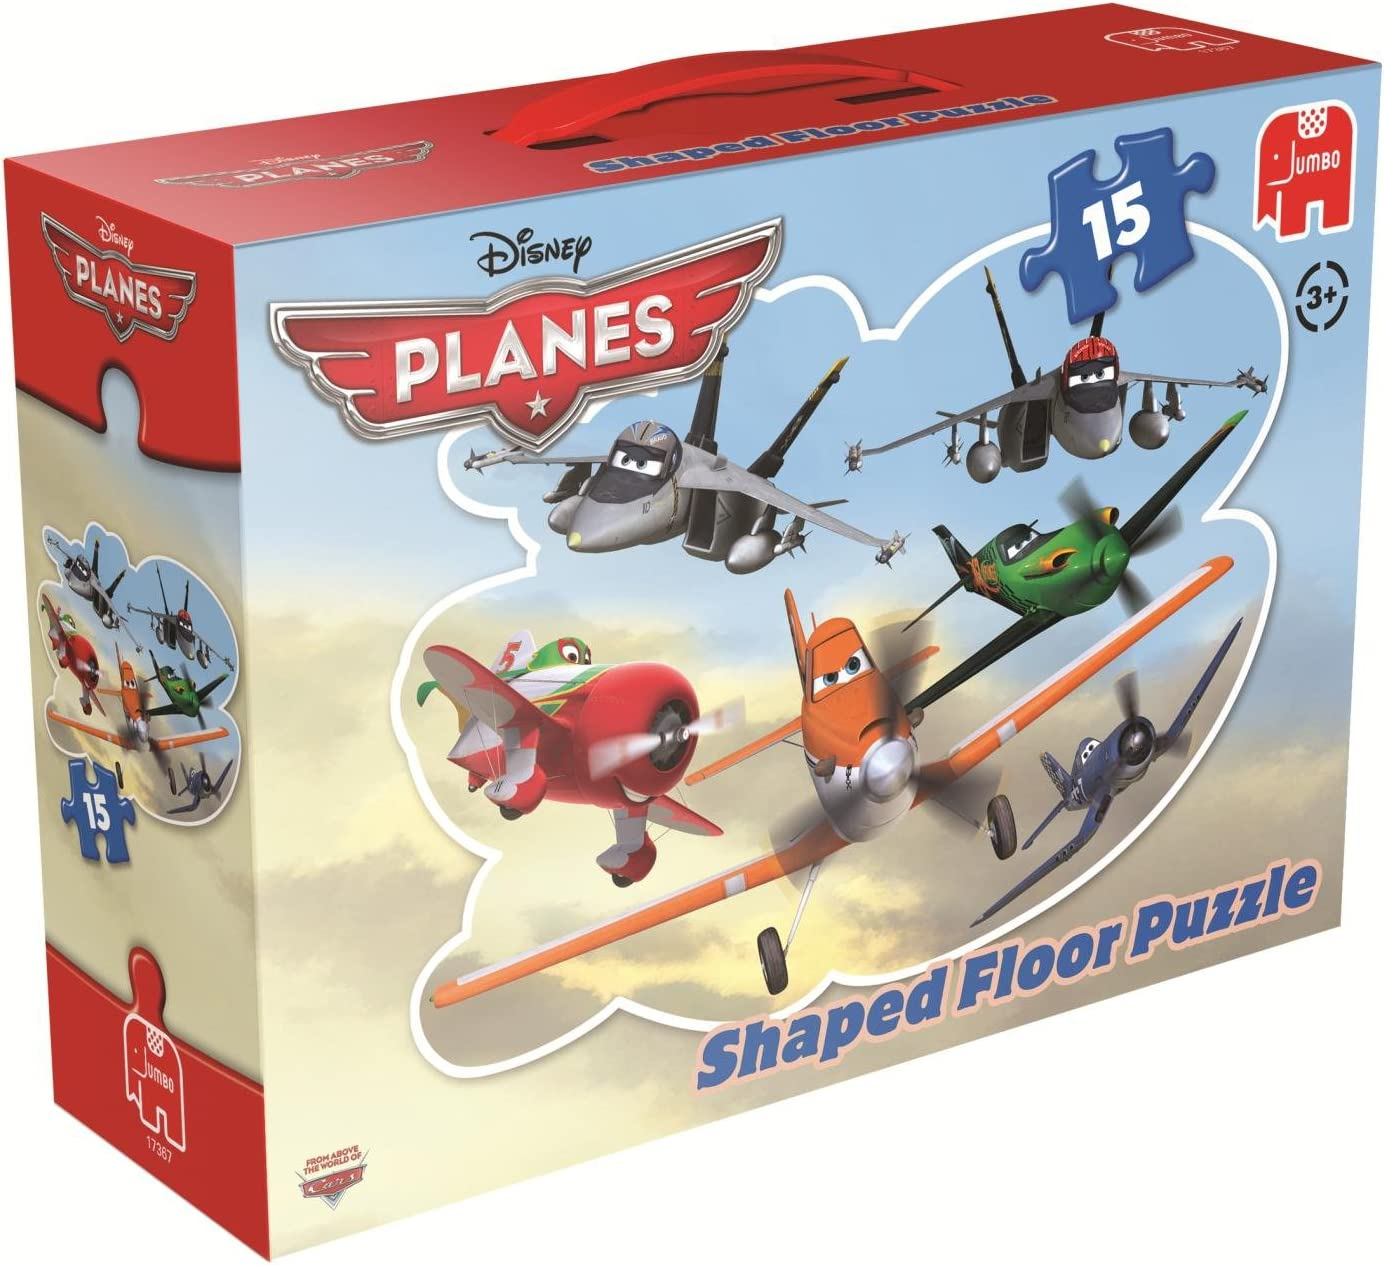 Disney Planes Shaped Floor Jigsaw Puzzle 15 Pieces Amazon Co Uk Toys Games